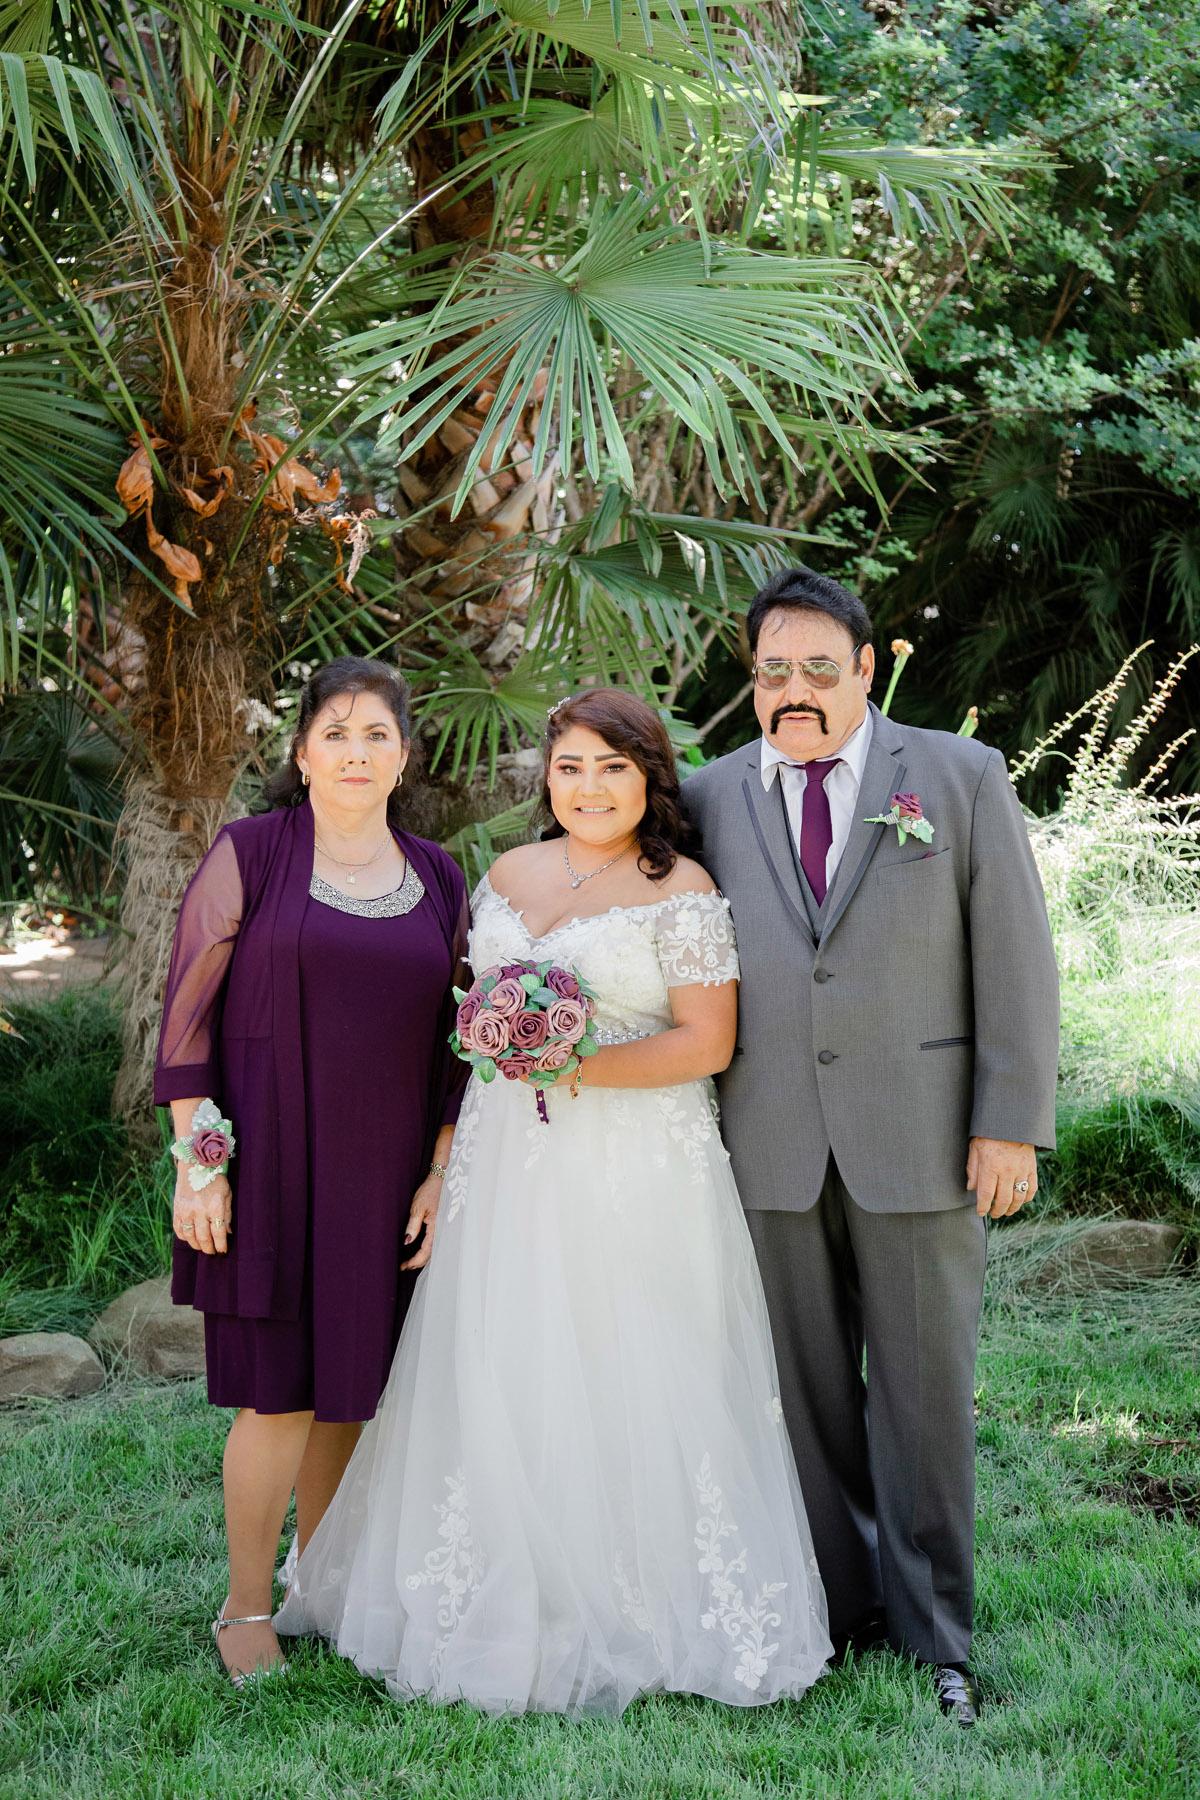 The Palms Hotel Chico Wedding Photos_10.jpg